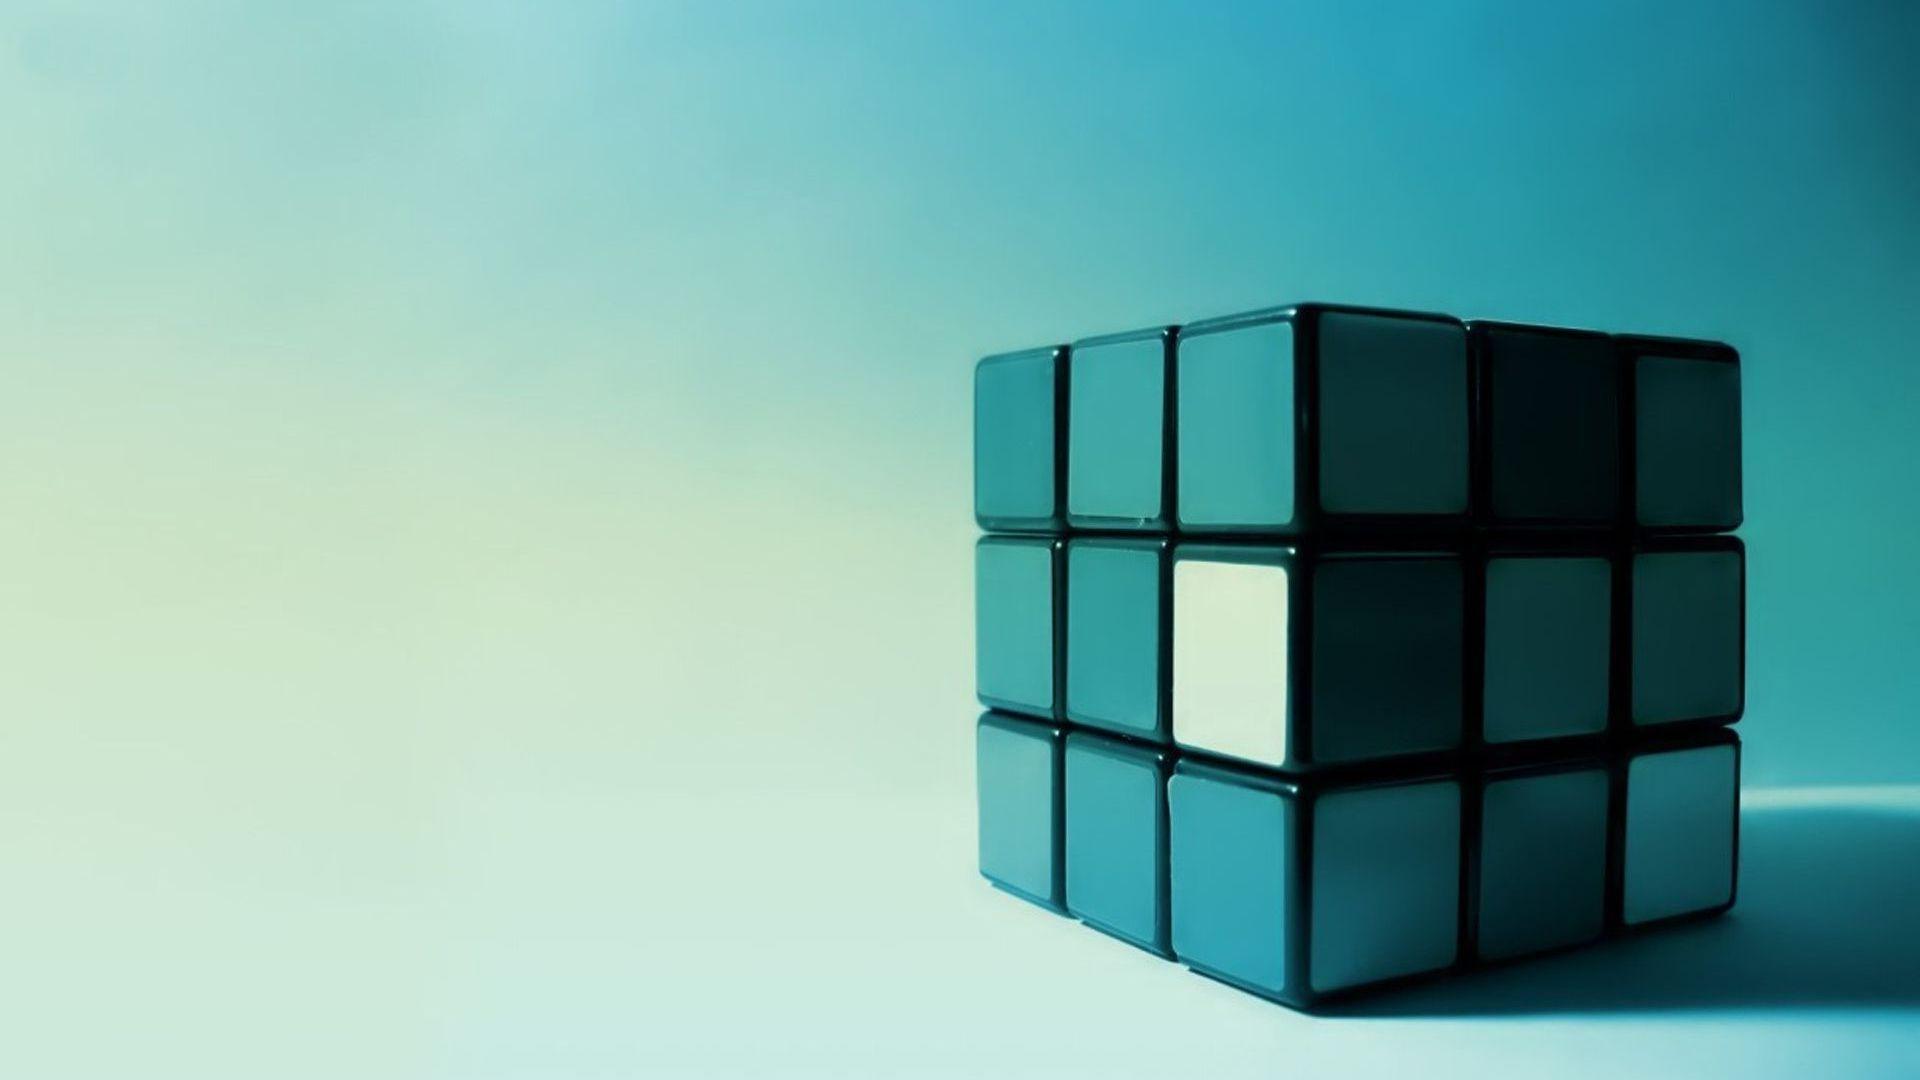 cube computer wallpapers desktop - photo #25